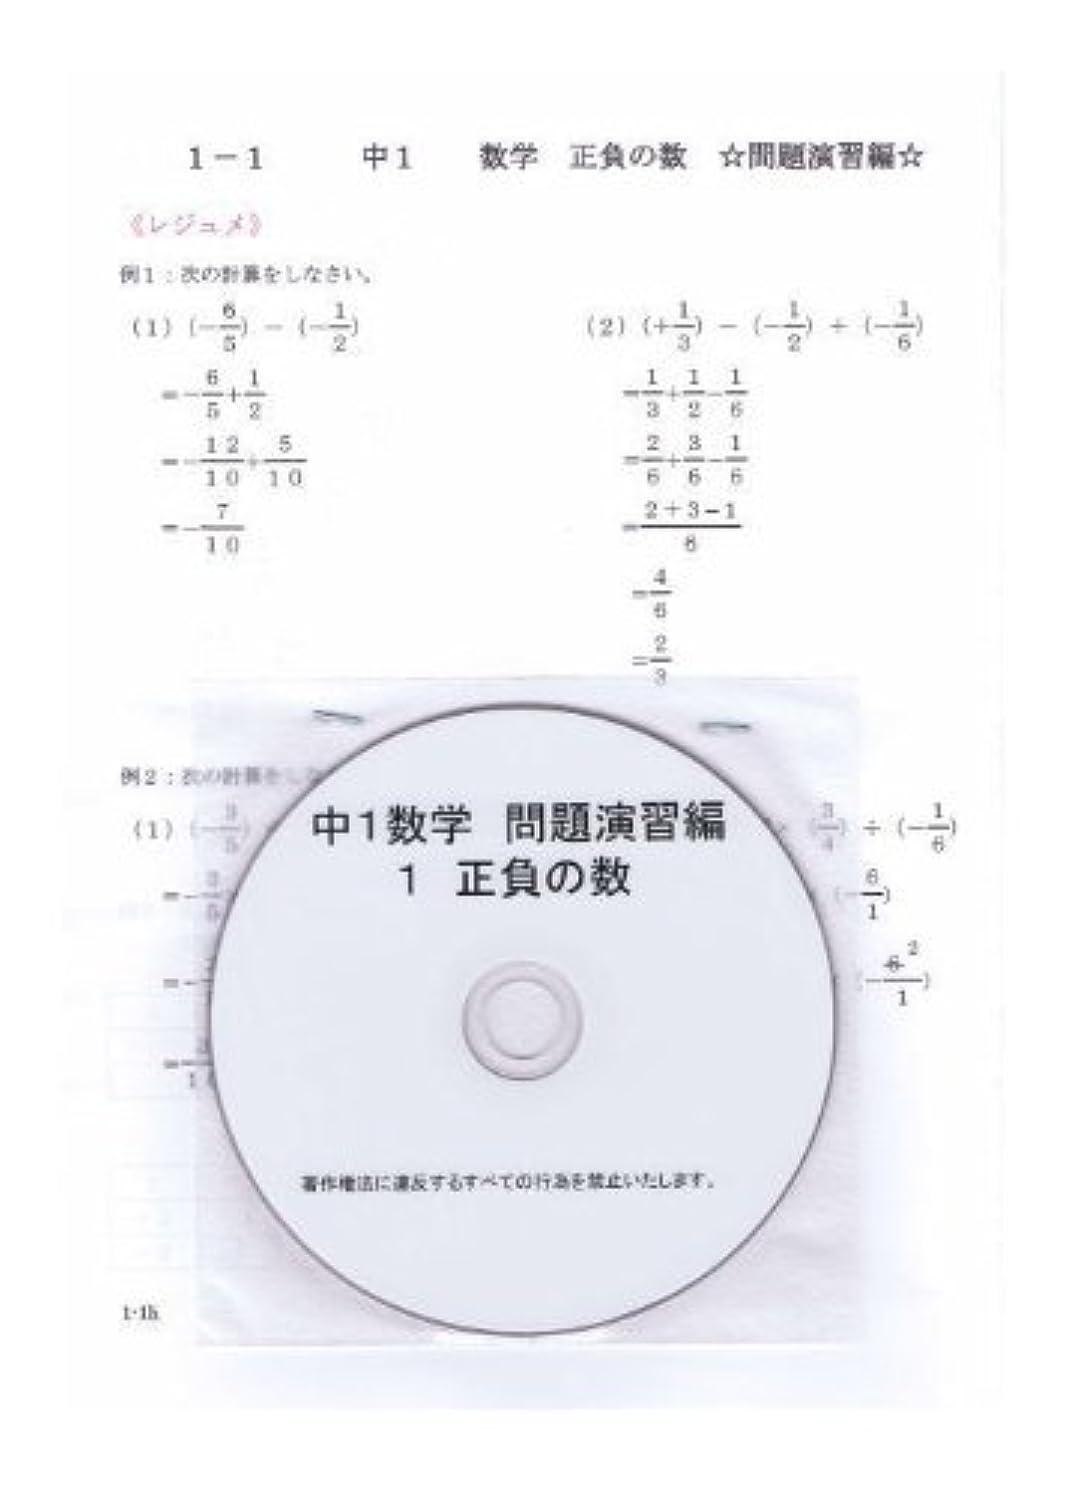 継承茎無駄だ中学 数学 1年【応用】問題集 2 文字の式 DVD (授業+テキスト+問題集)